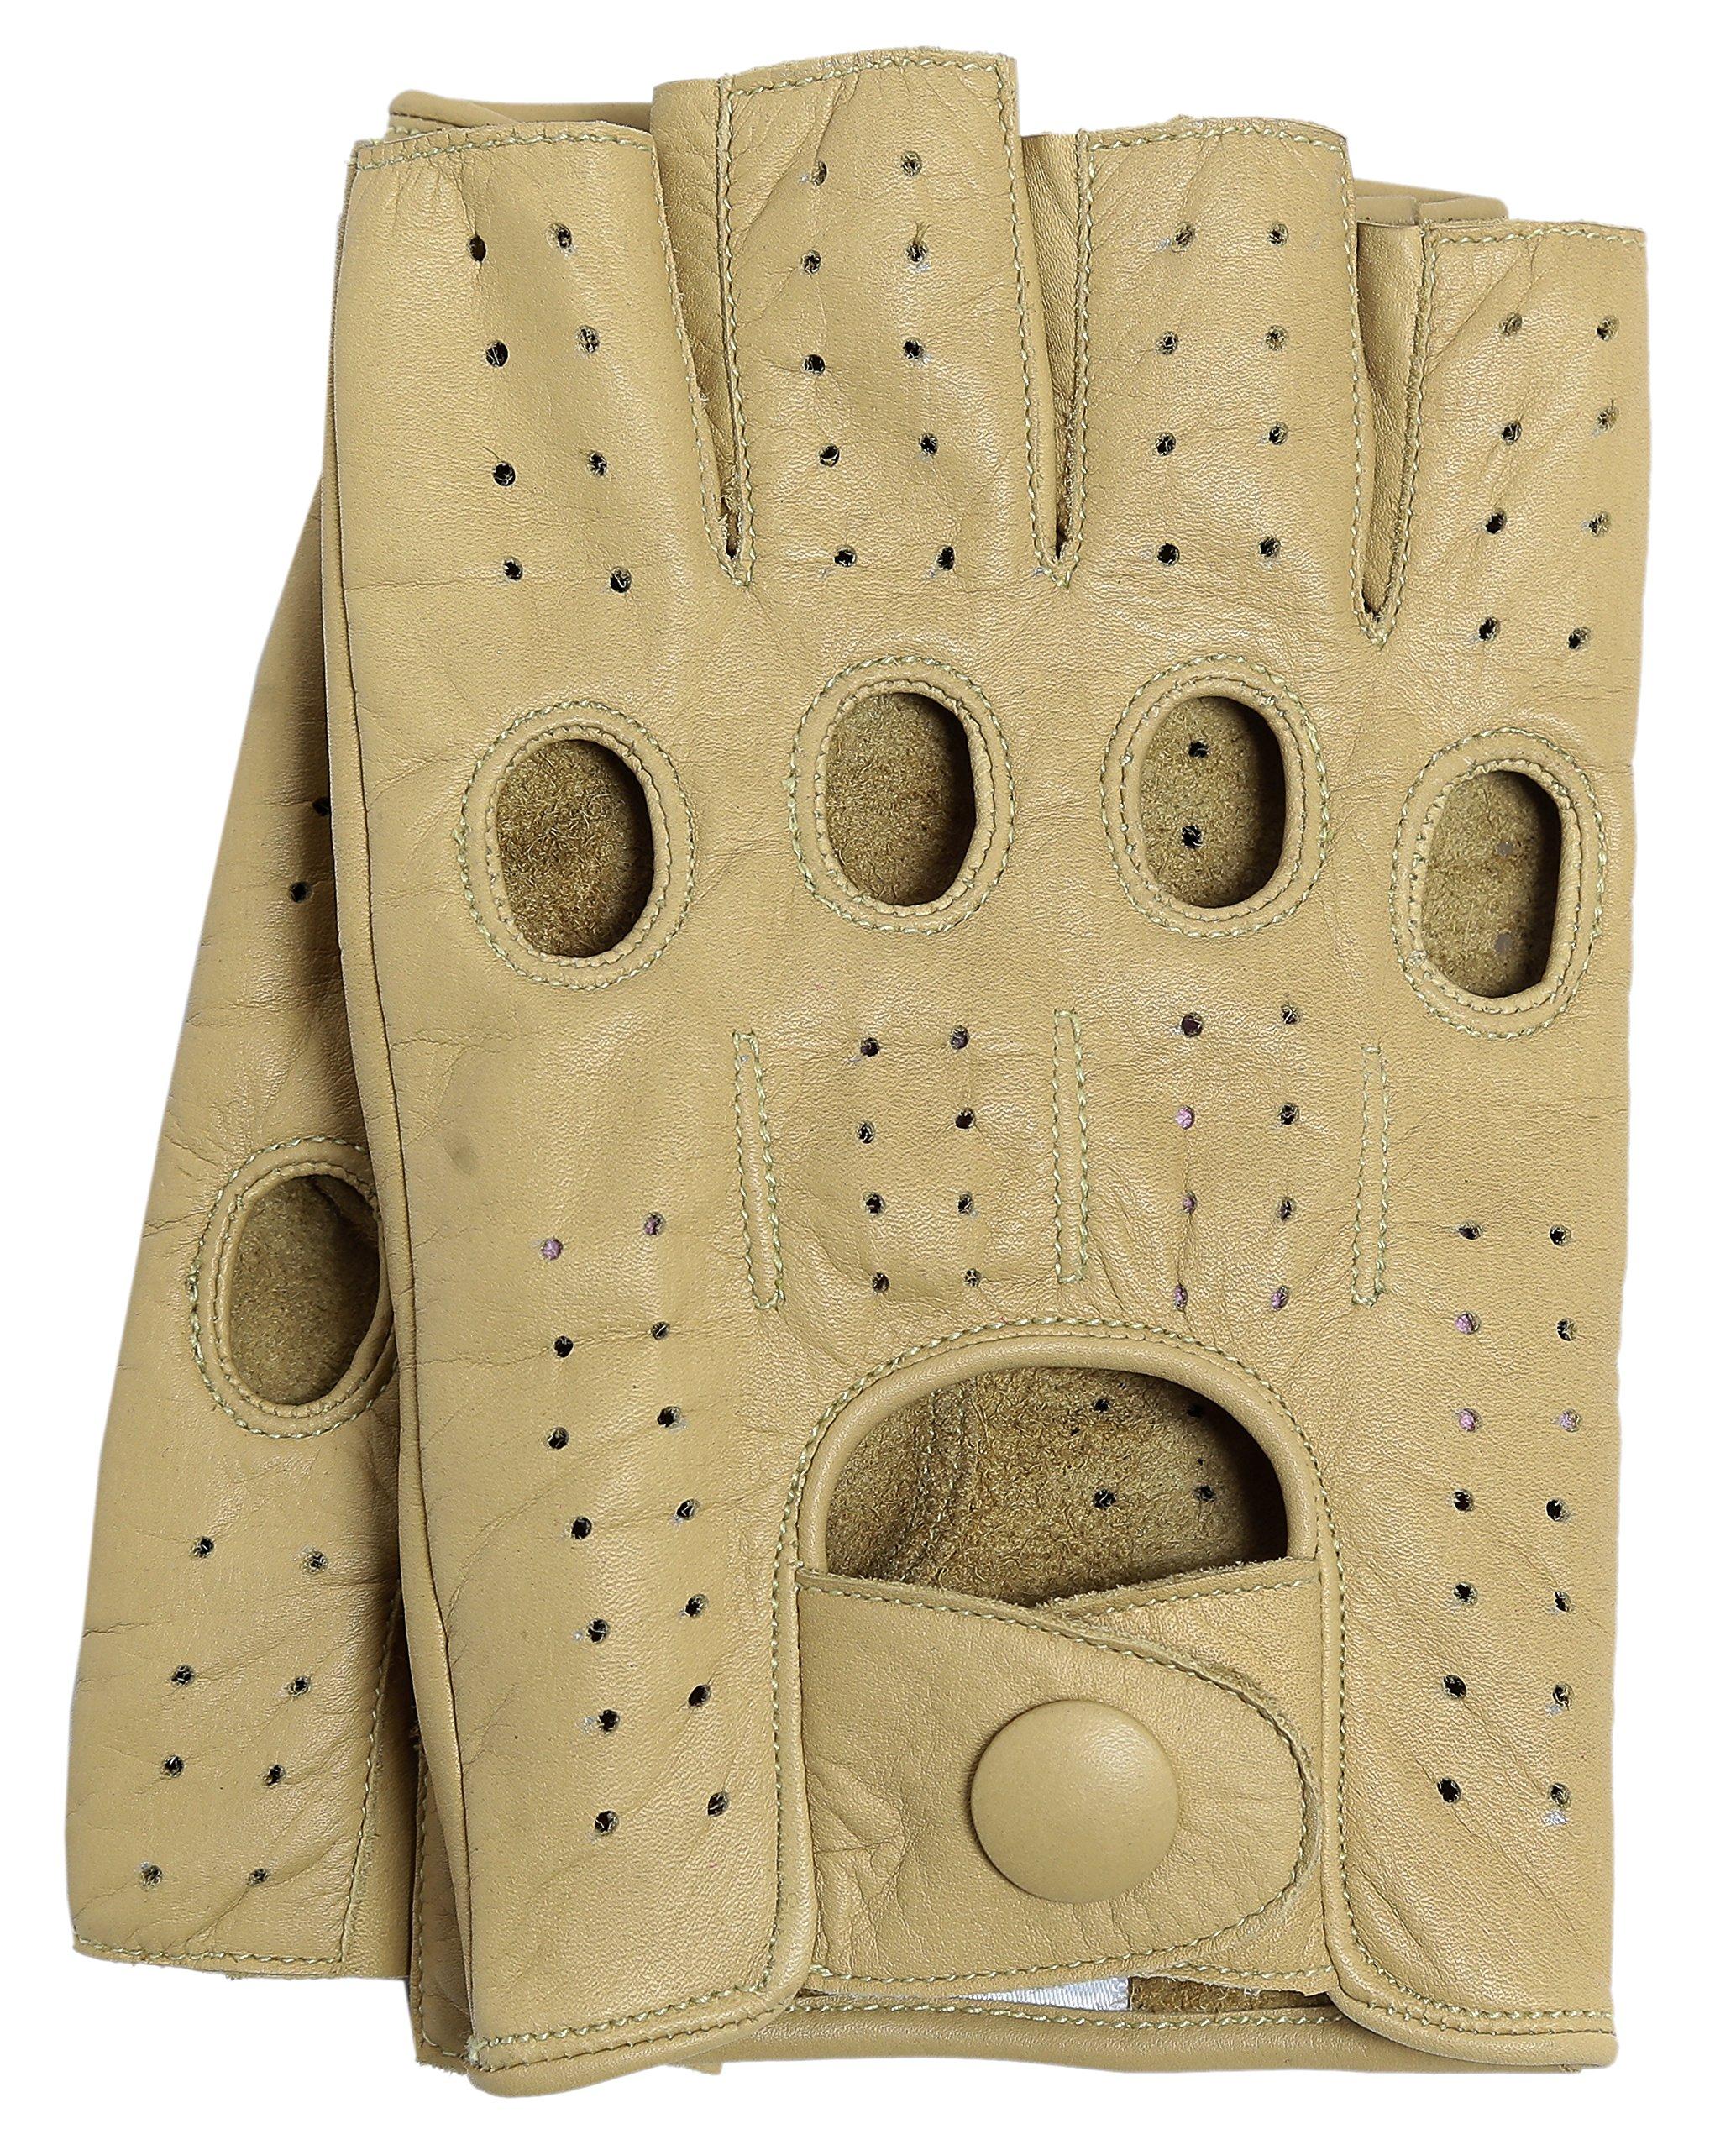 Riparo Women's Fingerless Half Finger Driving Motorcycle Unlined Leather Gloves (7, Sand)